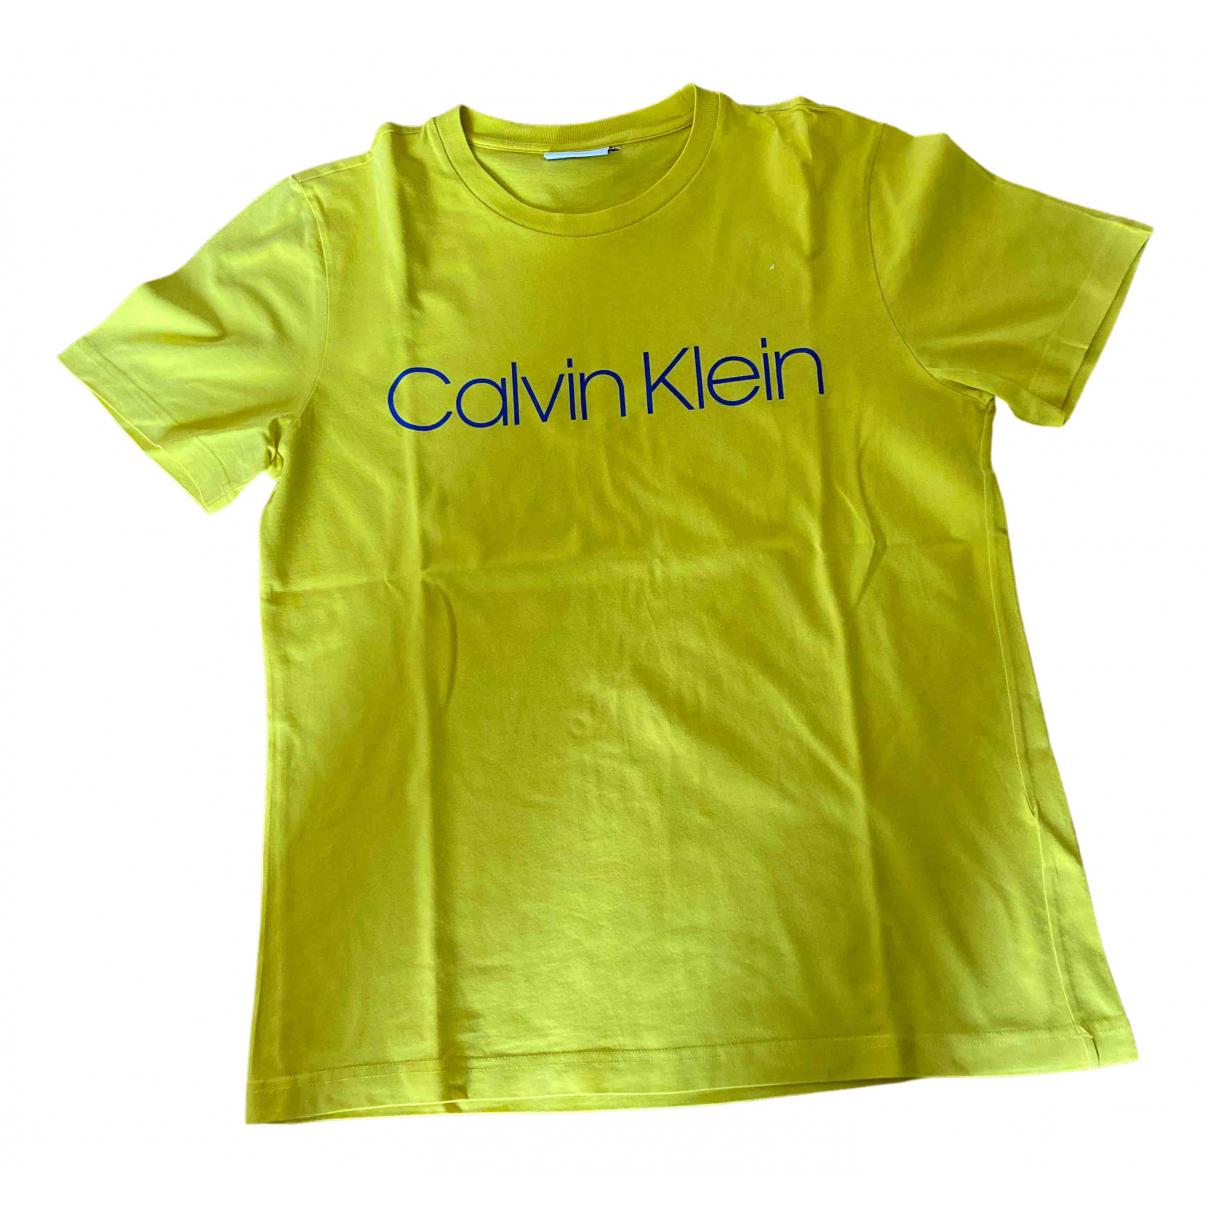 Calvin Klein - Tee shirts   pour homme en coton - jaune